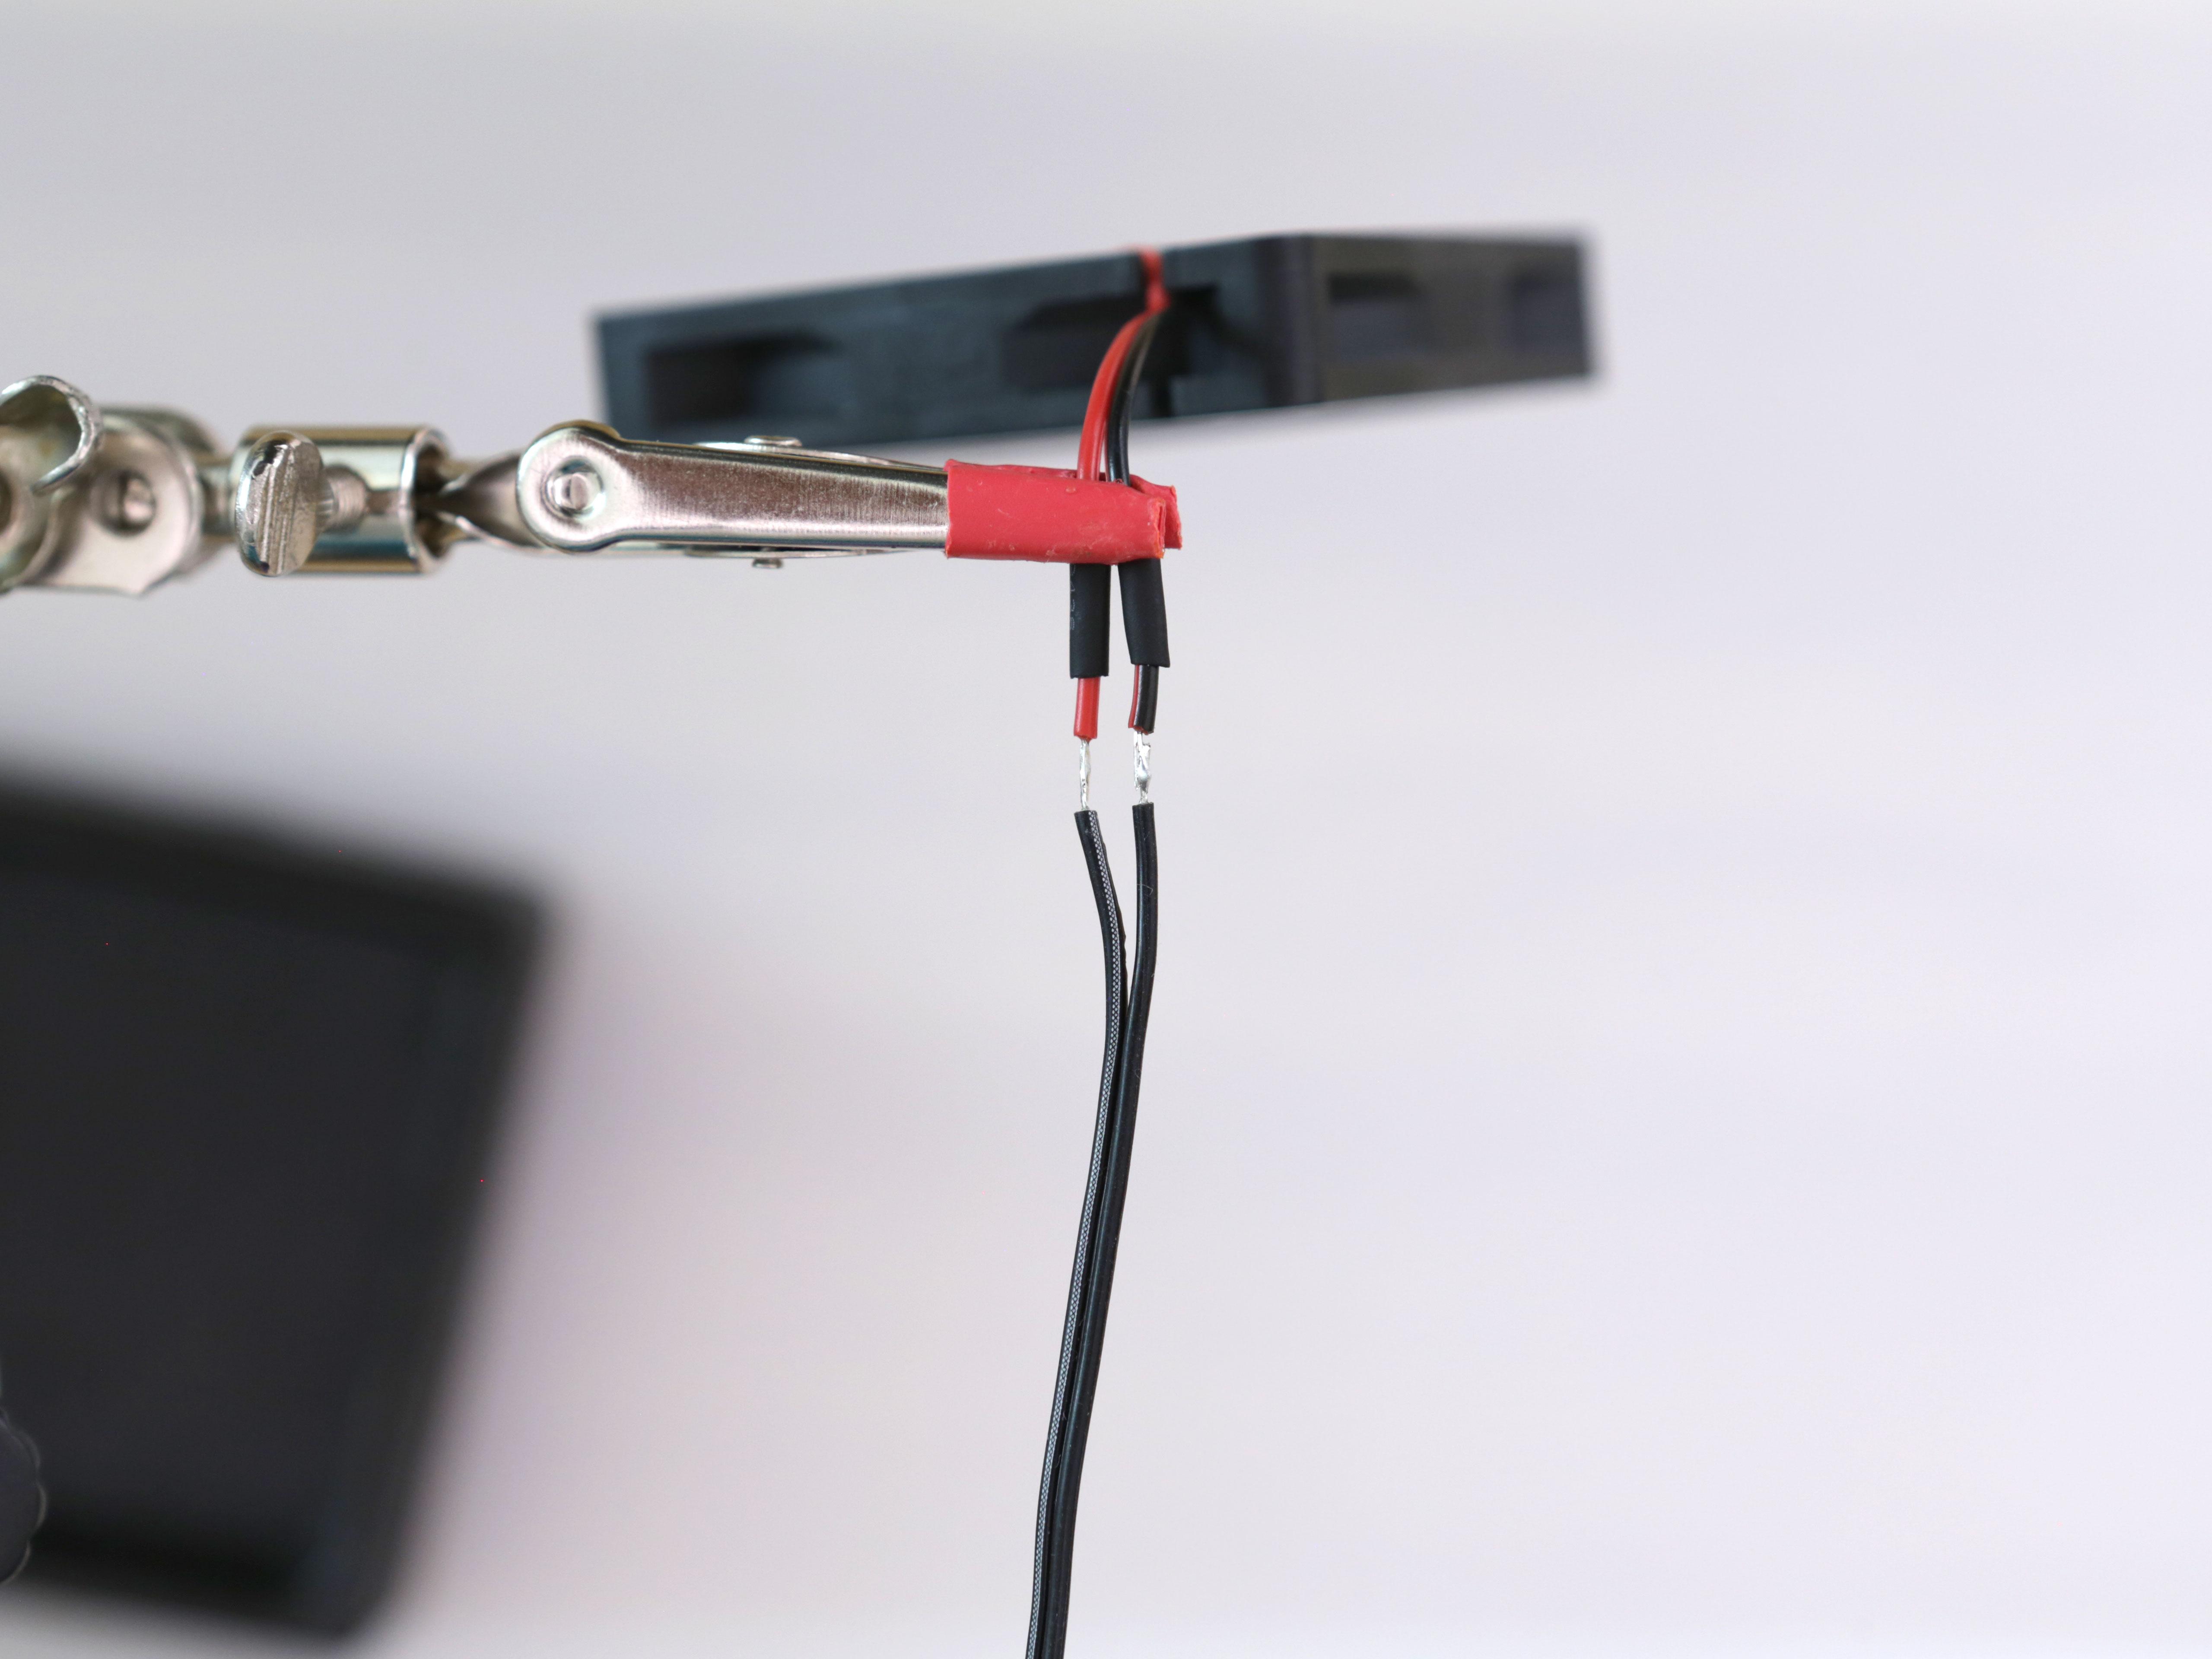 3d_printing_fan-wiring.jpg